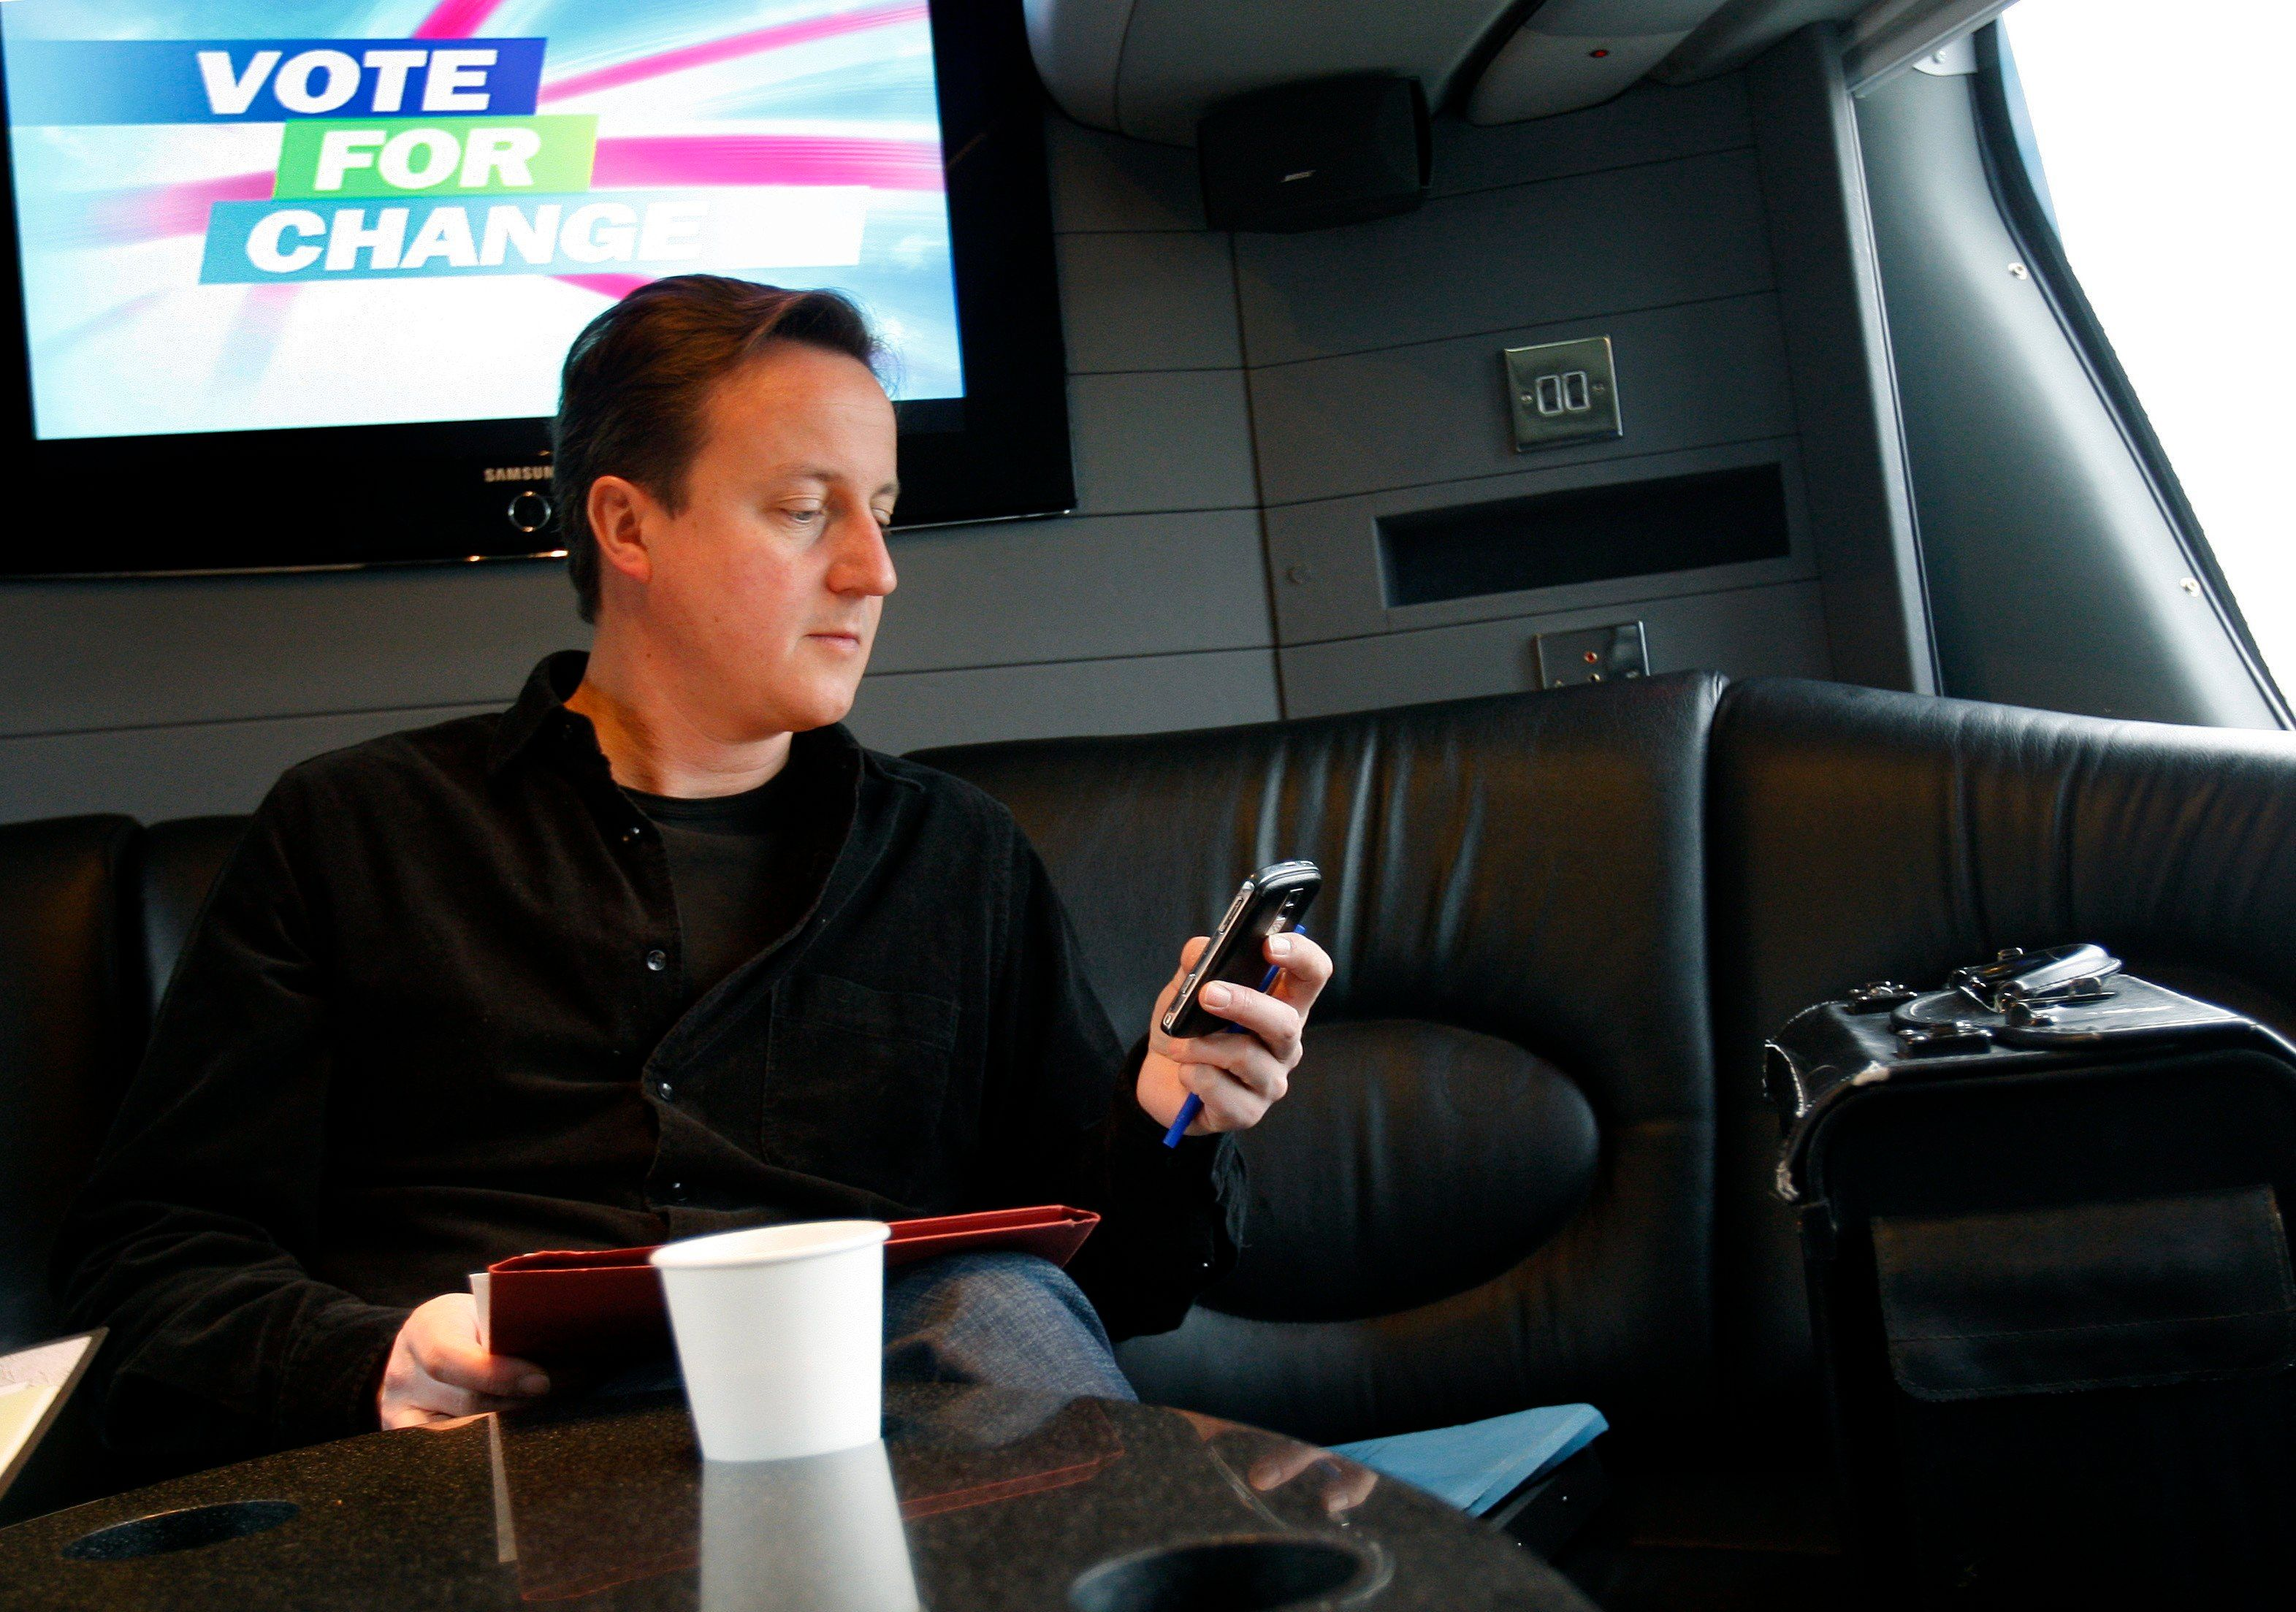 David Cameron Ups Voter Registration Drive For EU Referendum By Turning To